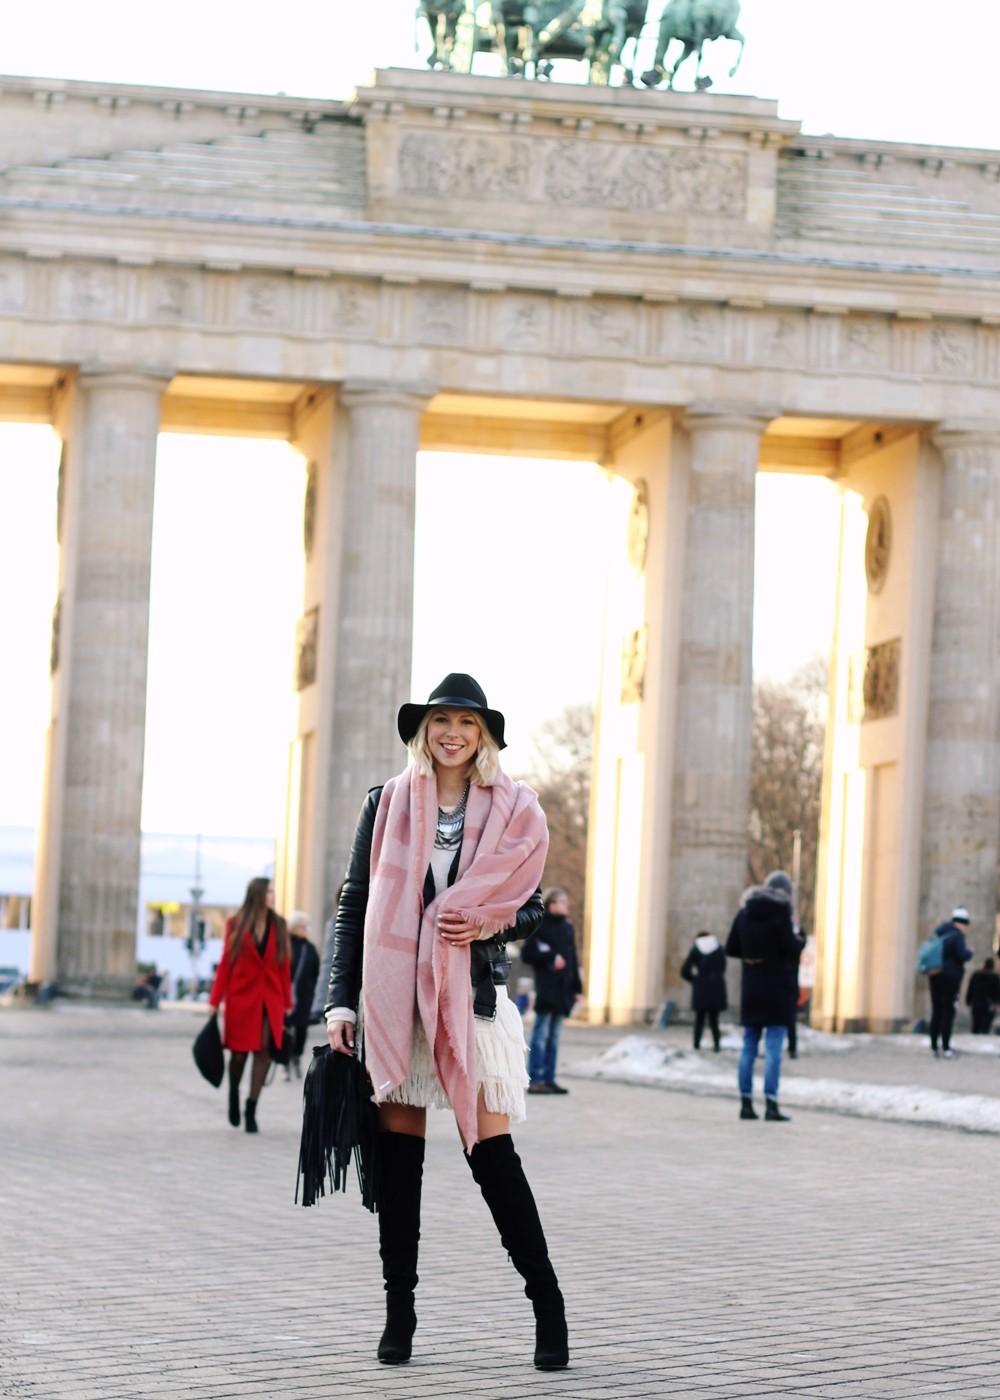 Fashion Week Berlin 2016 Outfit OOTD Fransen Strickkleid Lederjacke Overknees Schal Hut Fransentasche 4